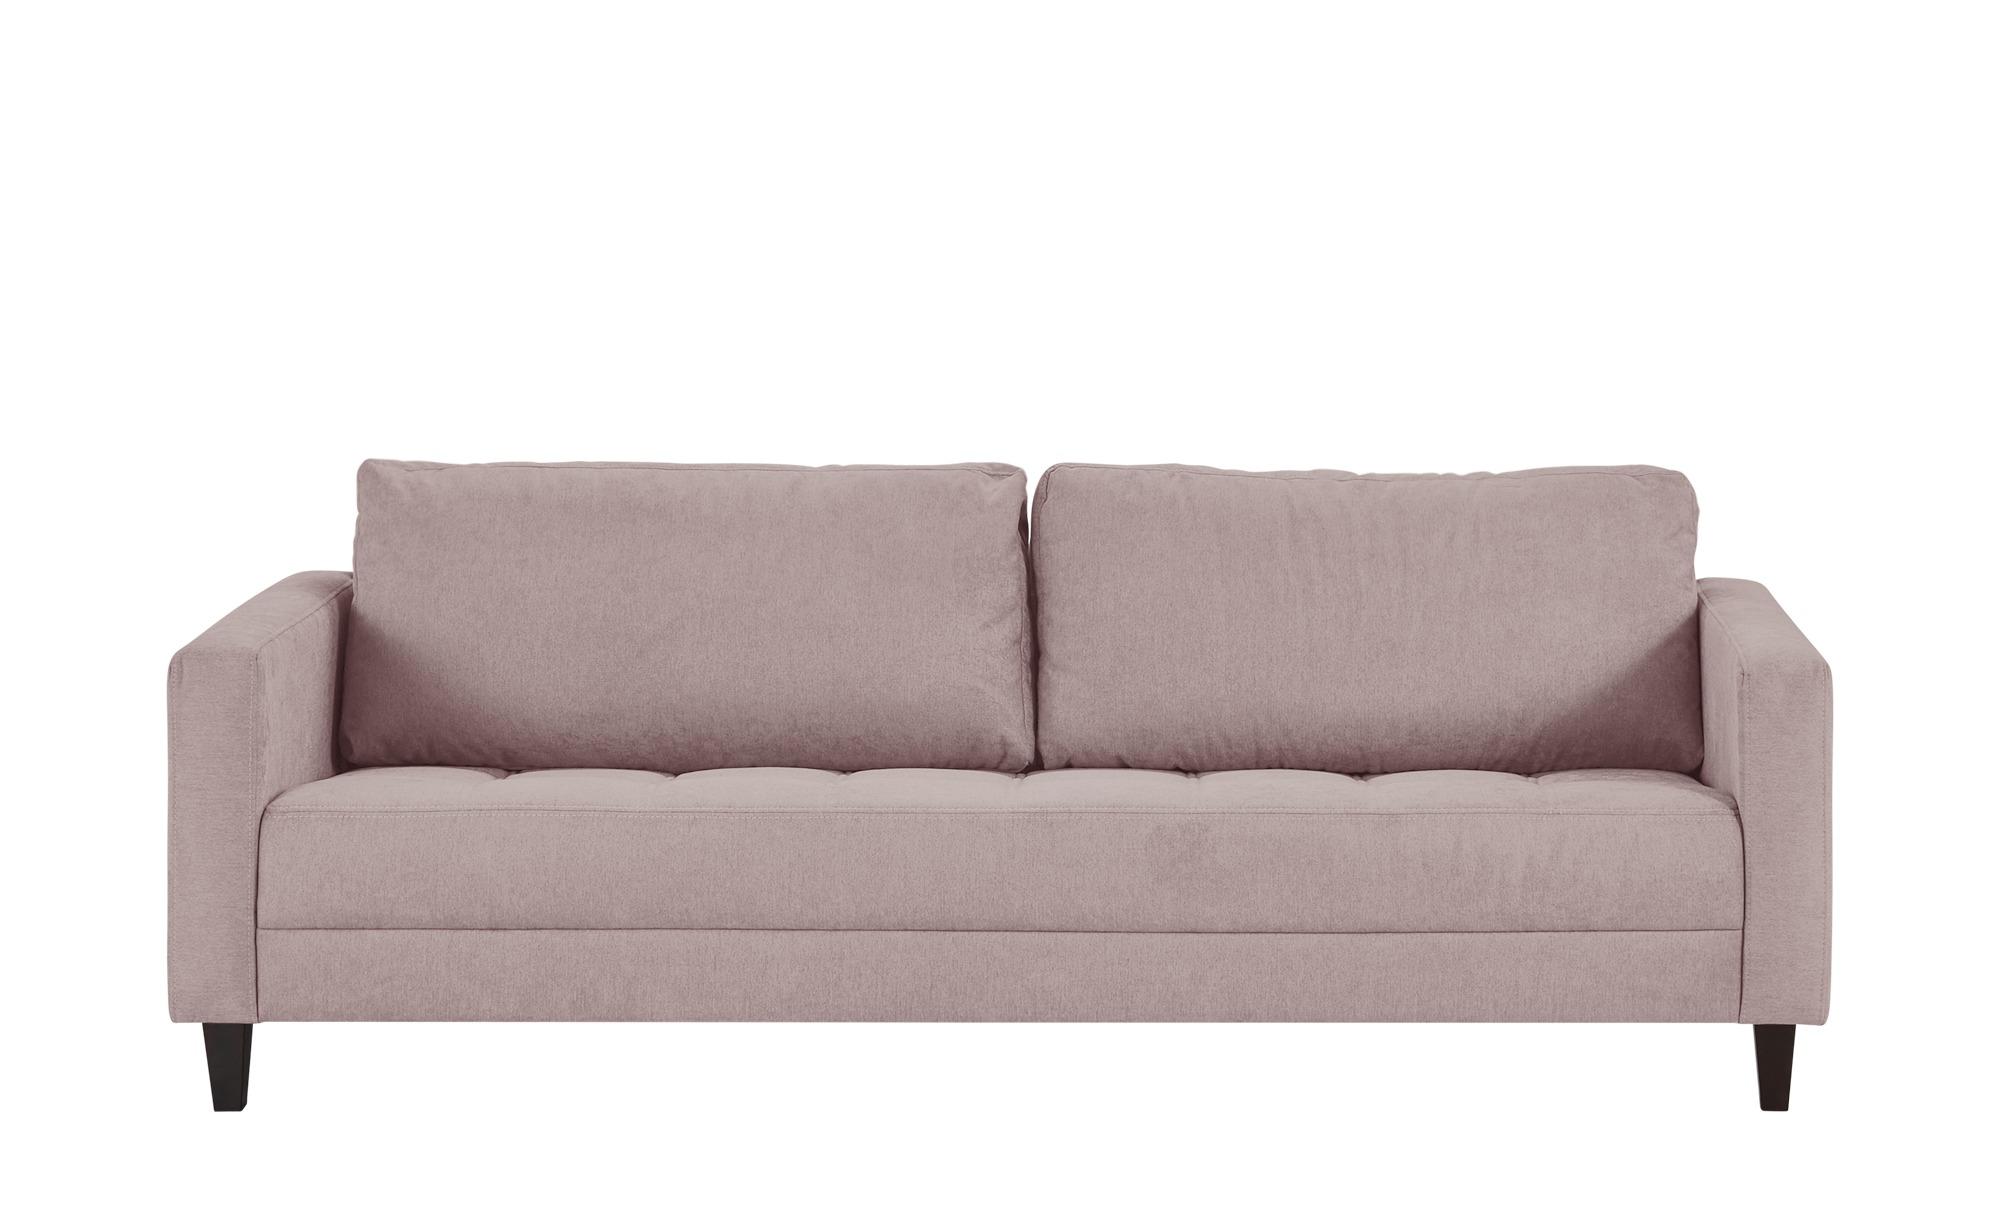 smart Sofa altrosa - Flachgewebe Geradine ¦ rosa/pink ¦ Maße (cm): B: 226 H: 93 T: 92 Polstermöbel > Sofas > 3-Sitzer - Höffner